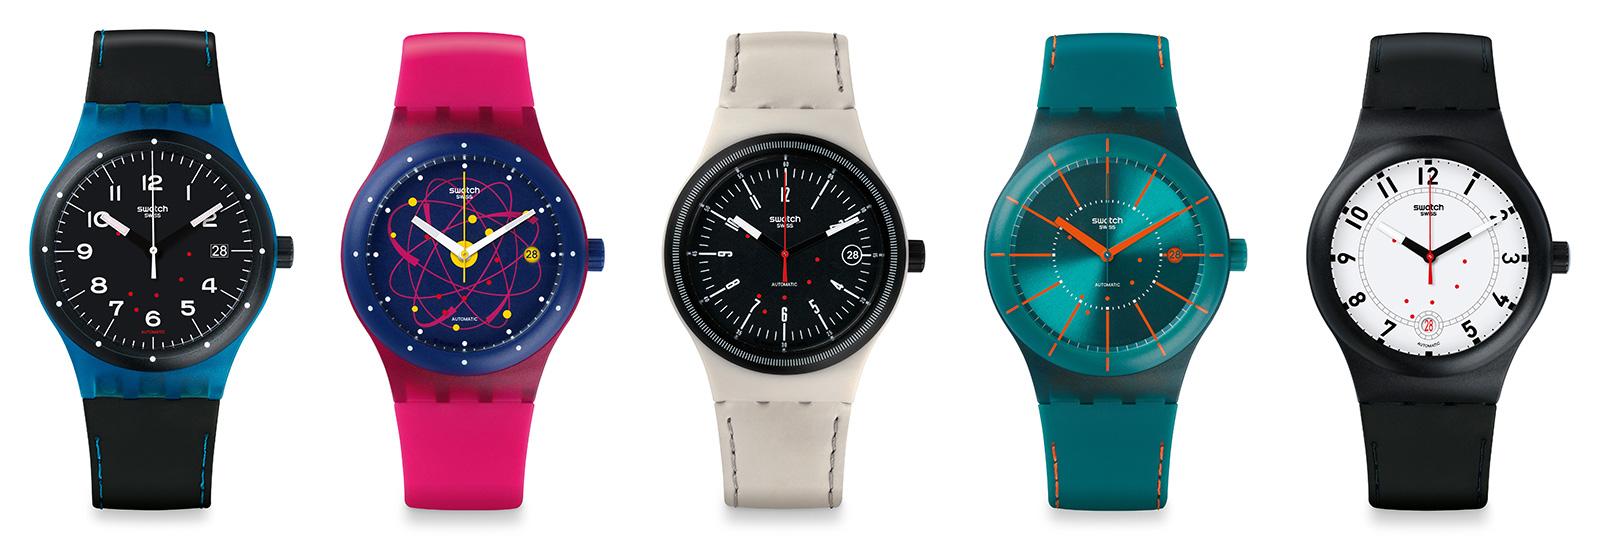 Swatch-Sistem51-2015